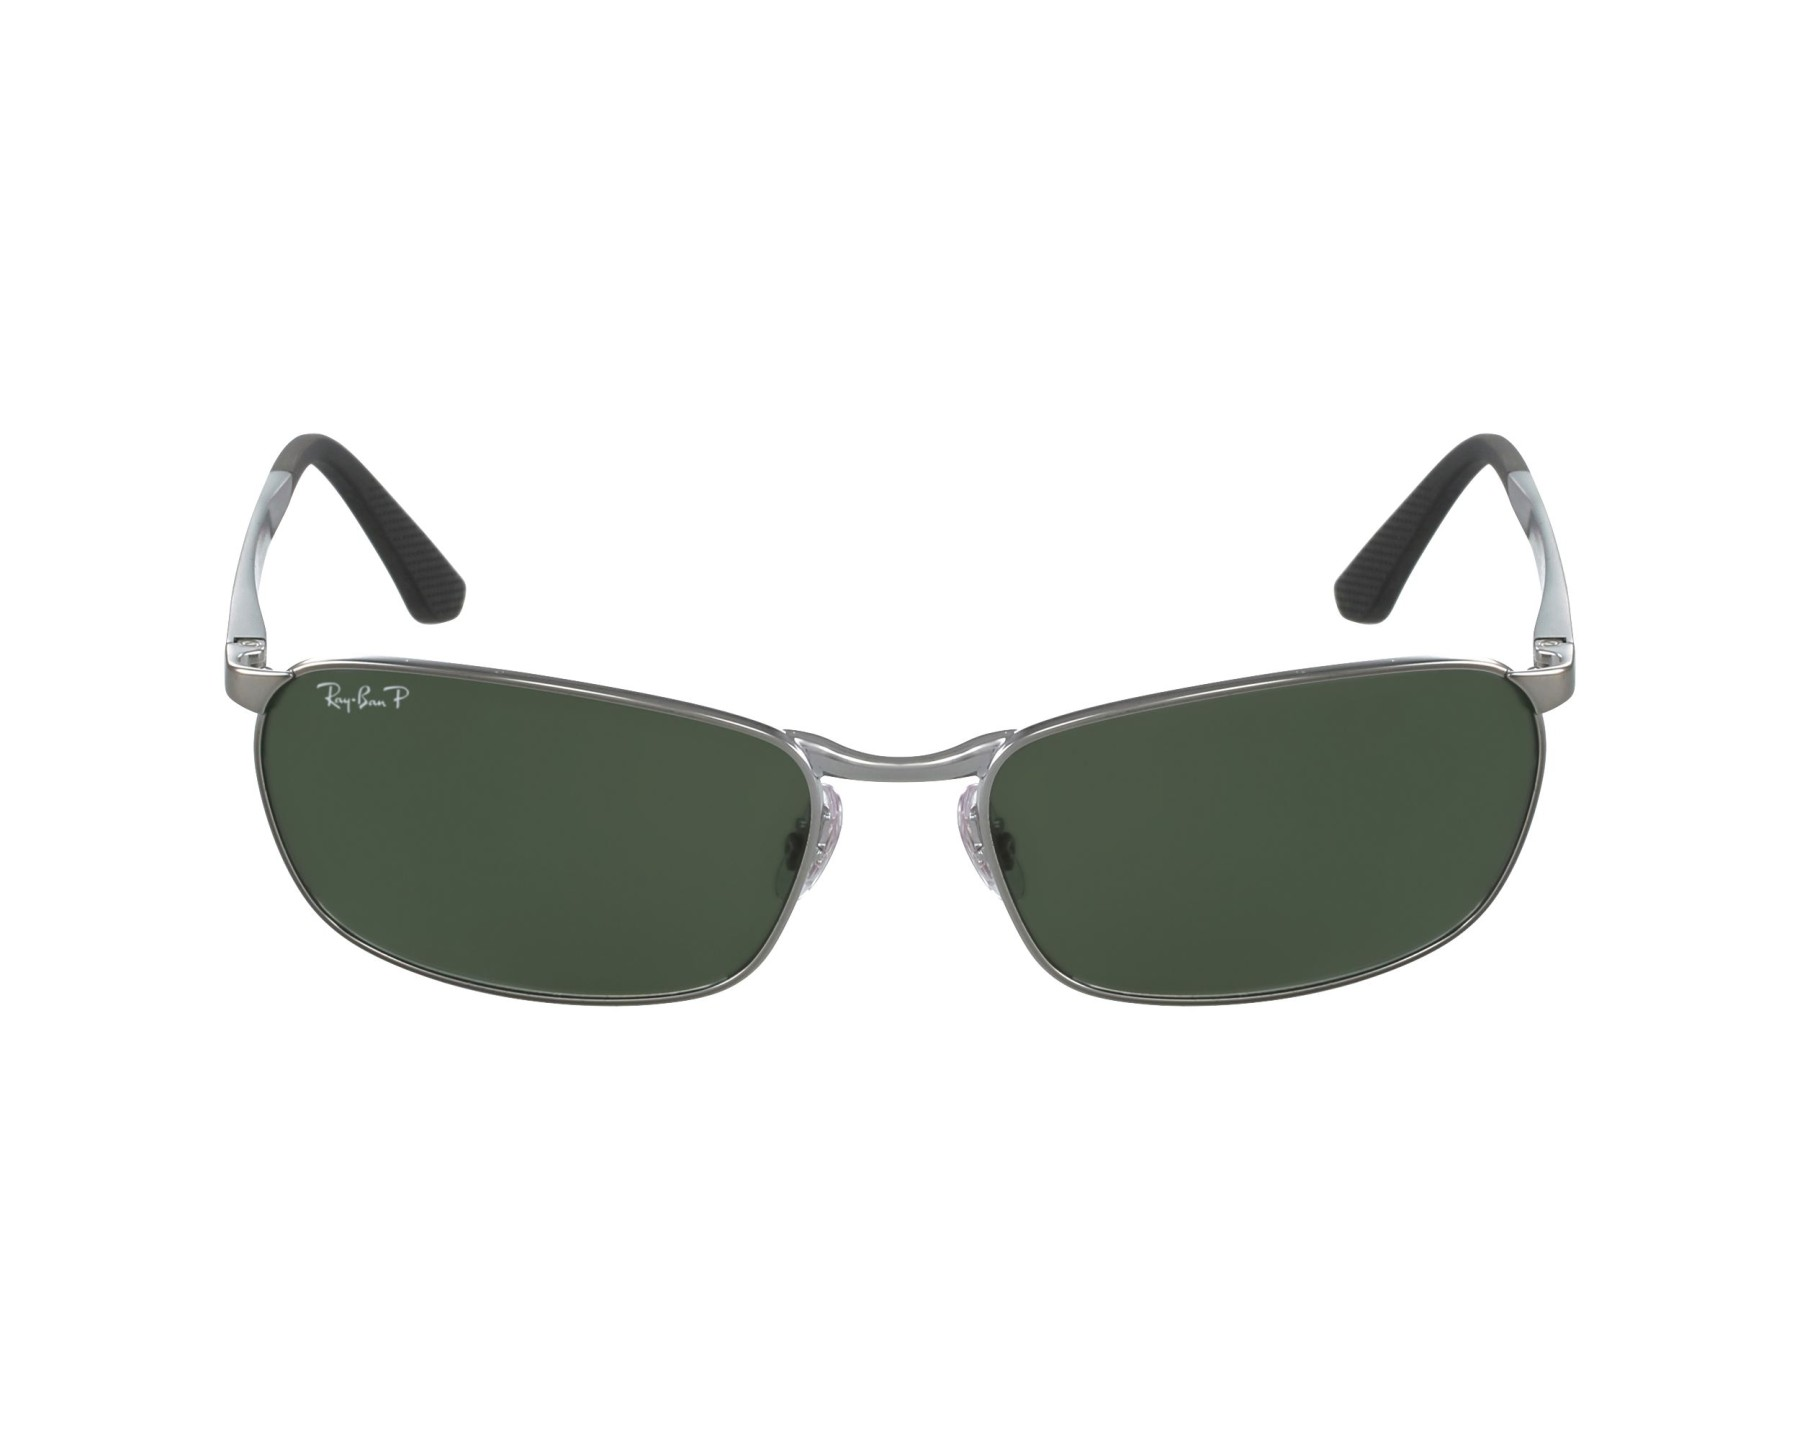 77f8c960f16 Sunglasses Ray-Ban RB-3534 004 58 59-17 Silver profile view